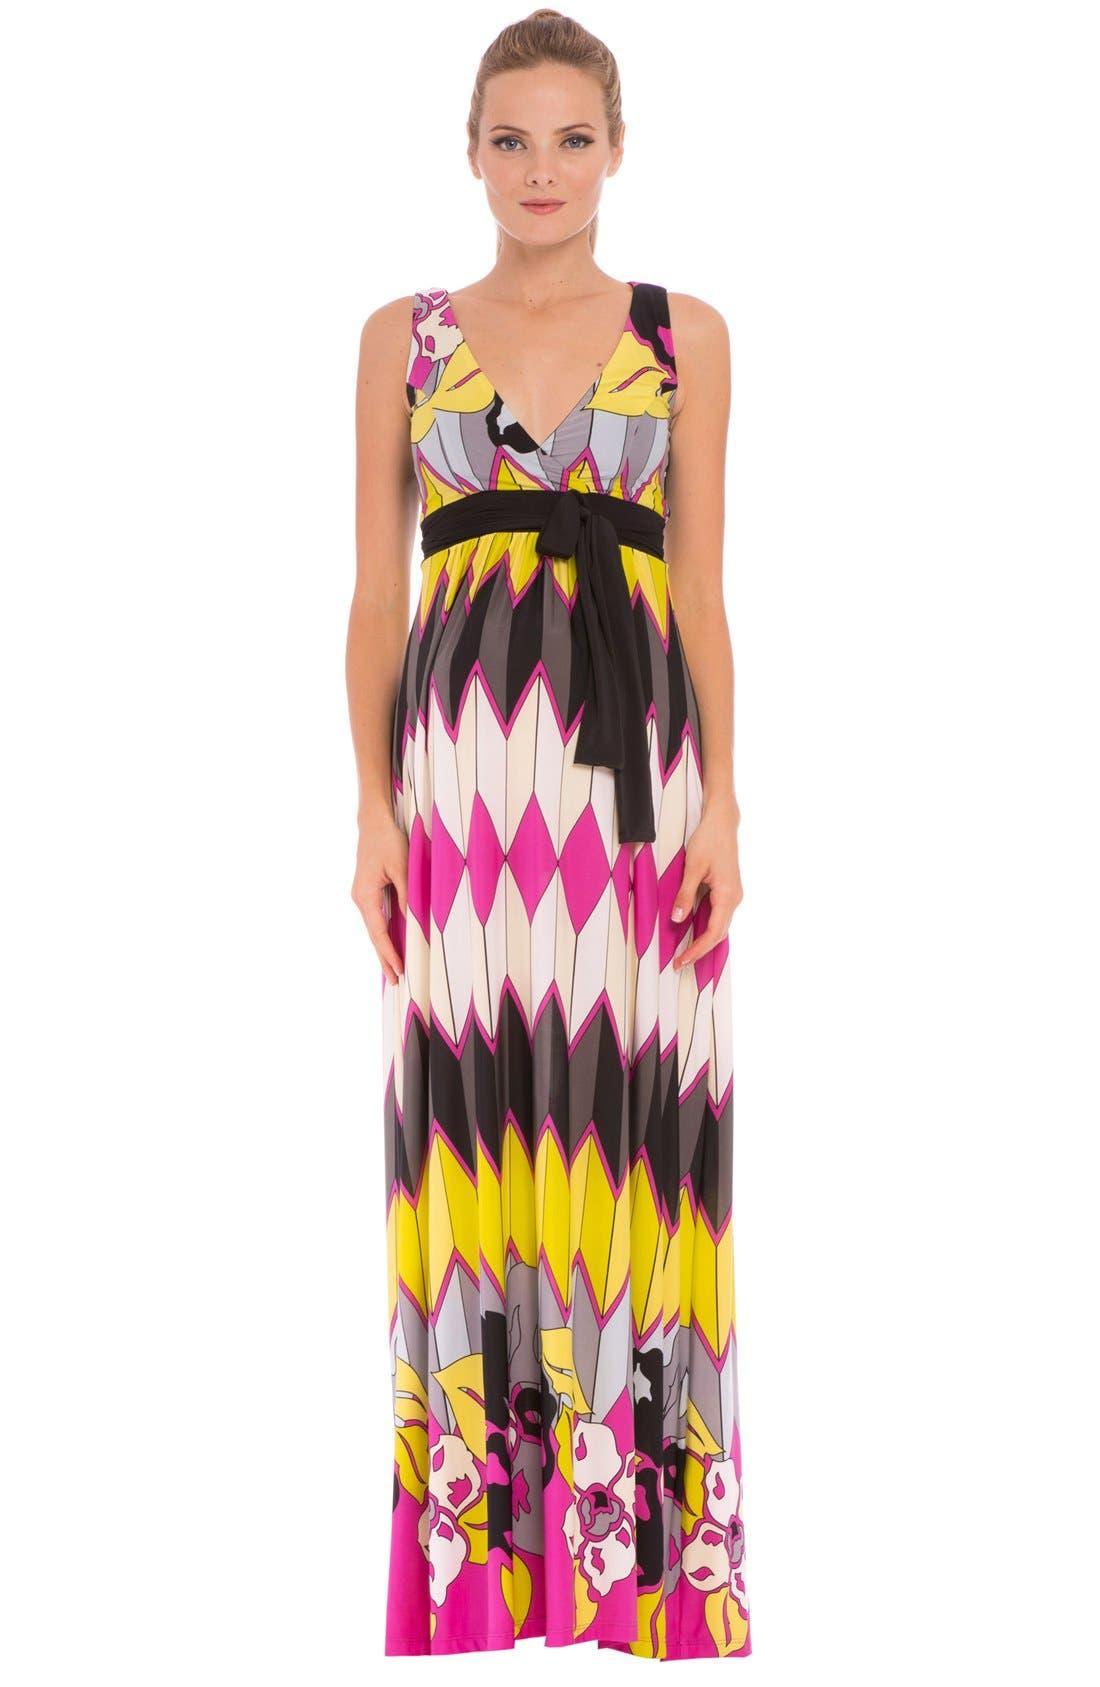 Olian 'Natasha' Print Maternity Maxi Dress